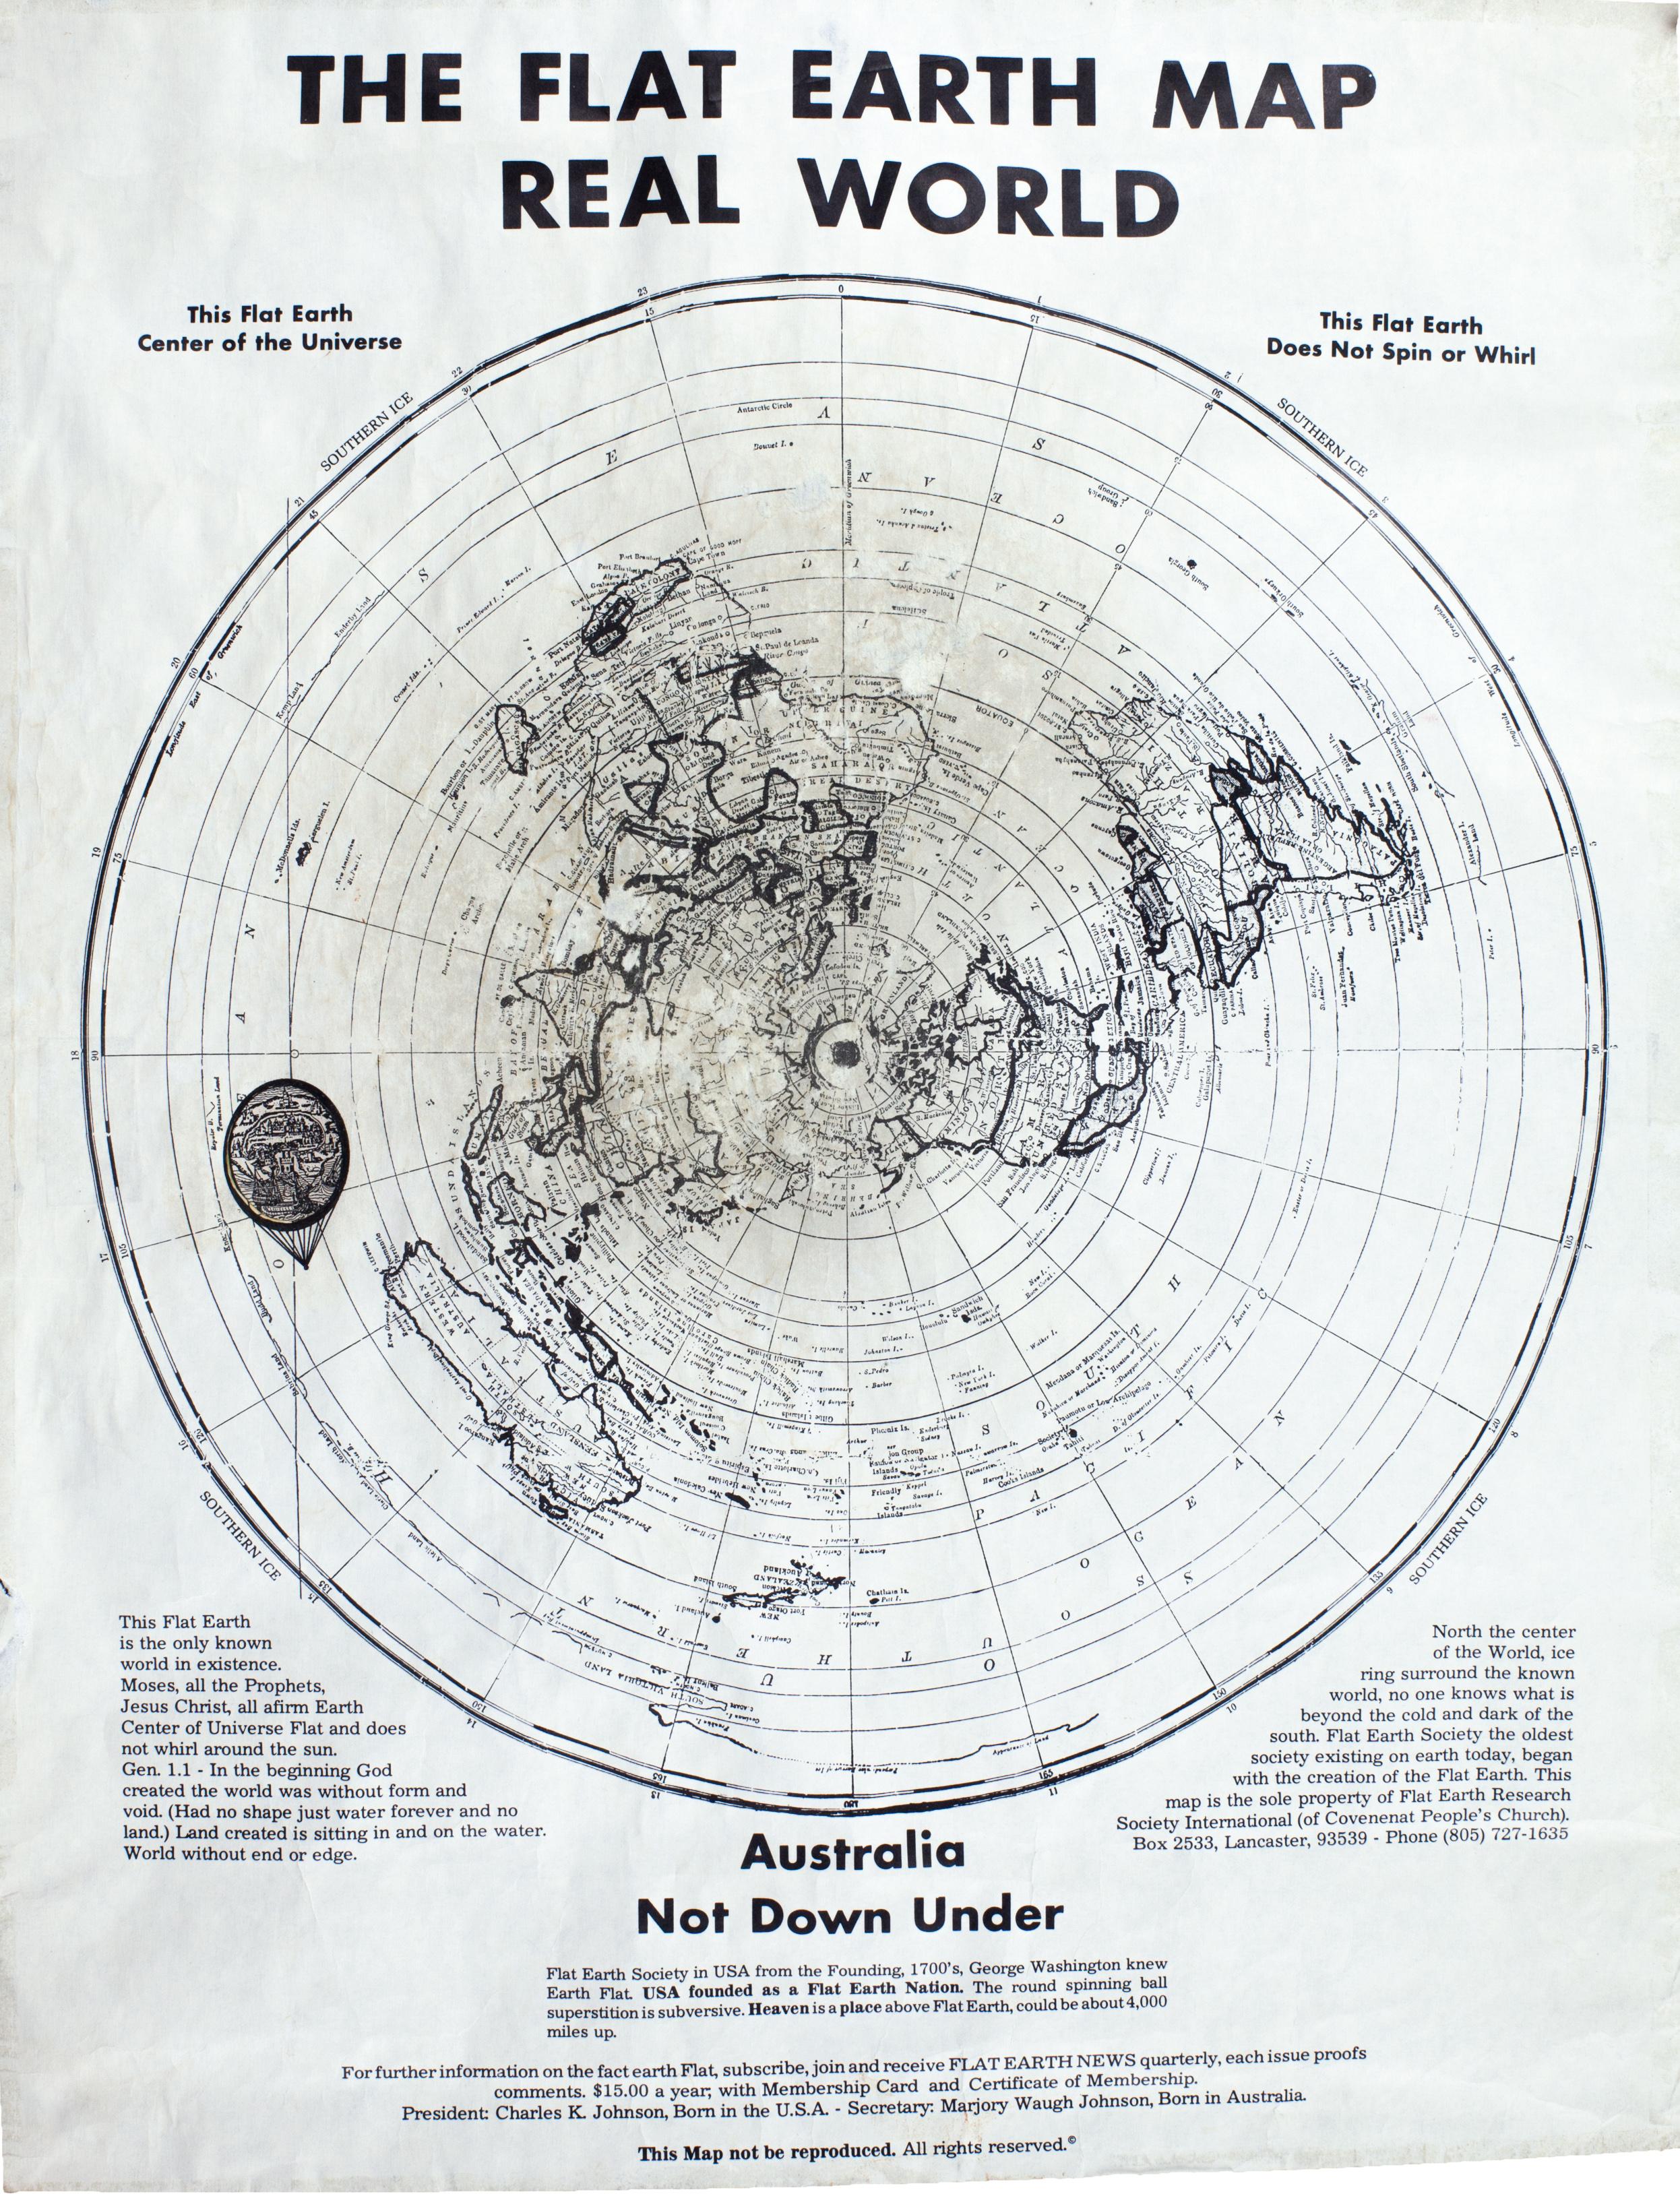 01 Flat Earth Society Map (Charles K. Johnson)